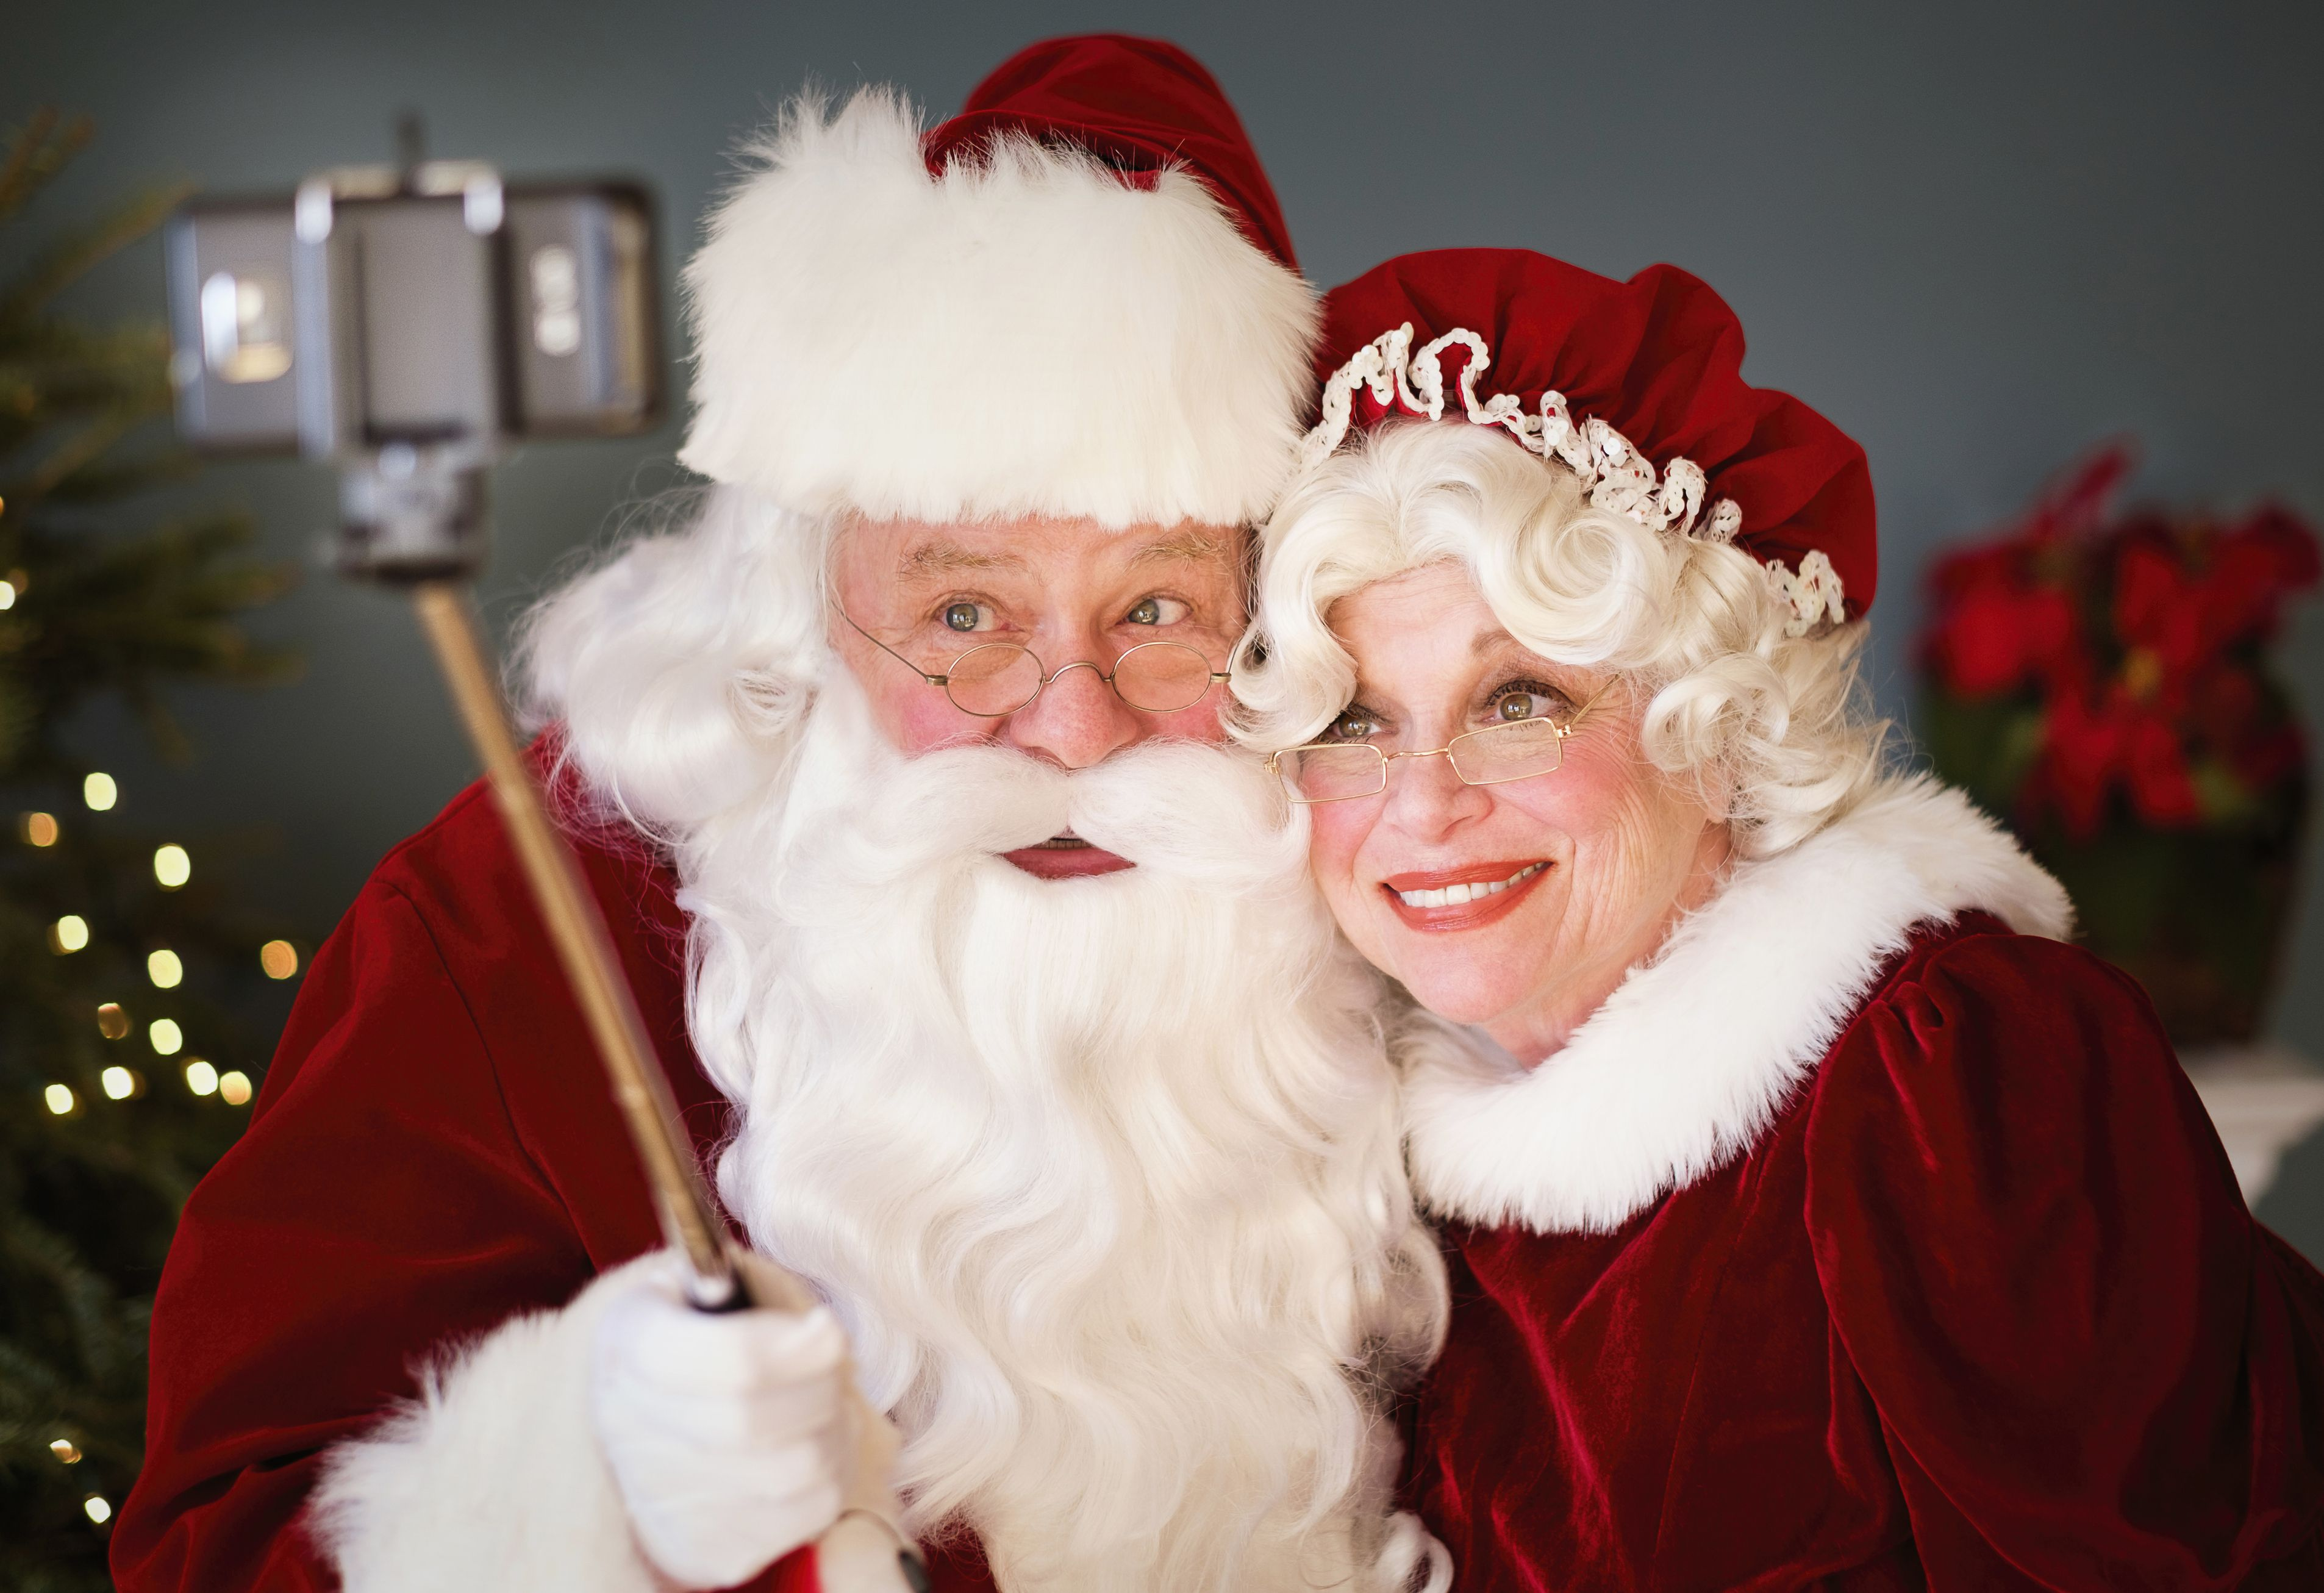 60 christmas captions for instagram best captions for holiday photos - Cute Christmas Captions